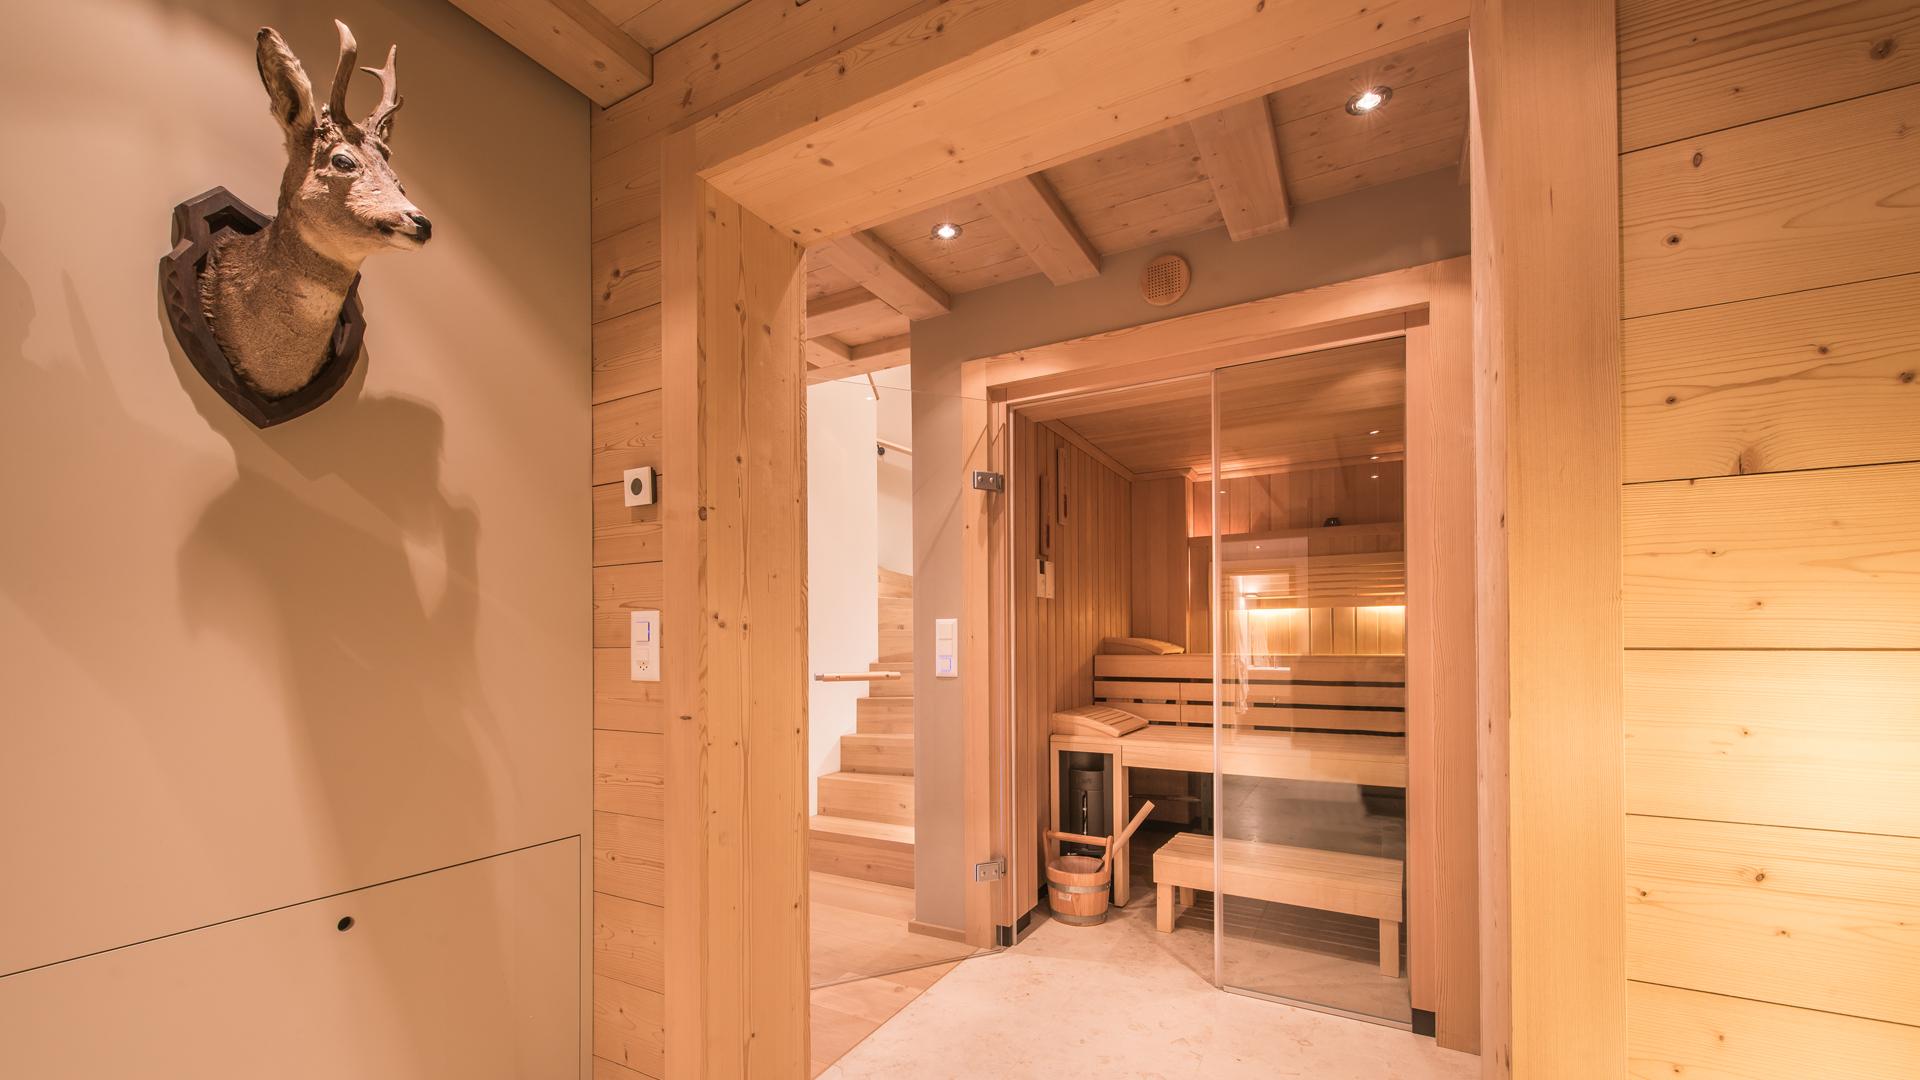 Paradiso 1 Apartments, Switzerland